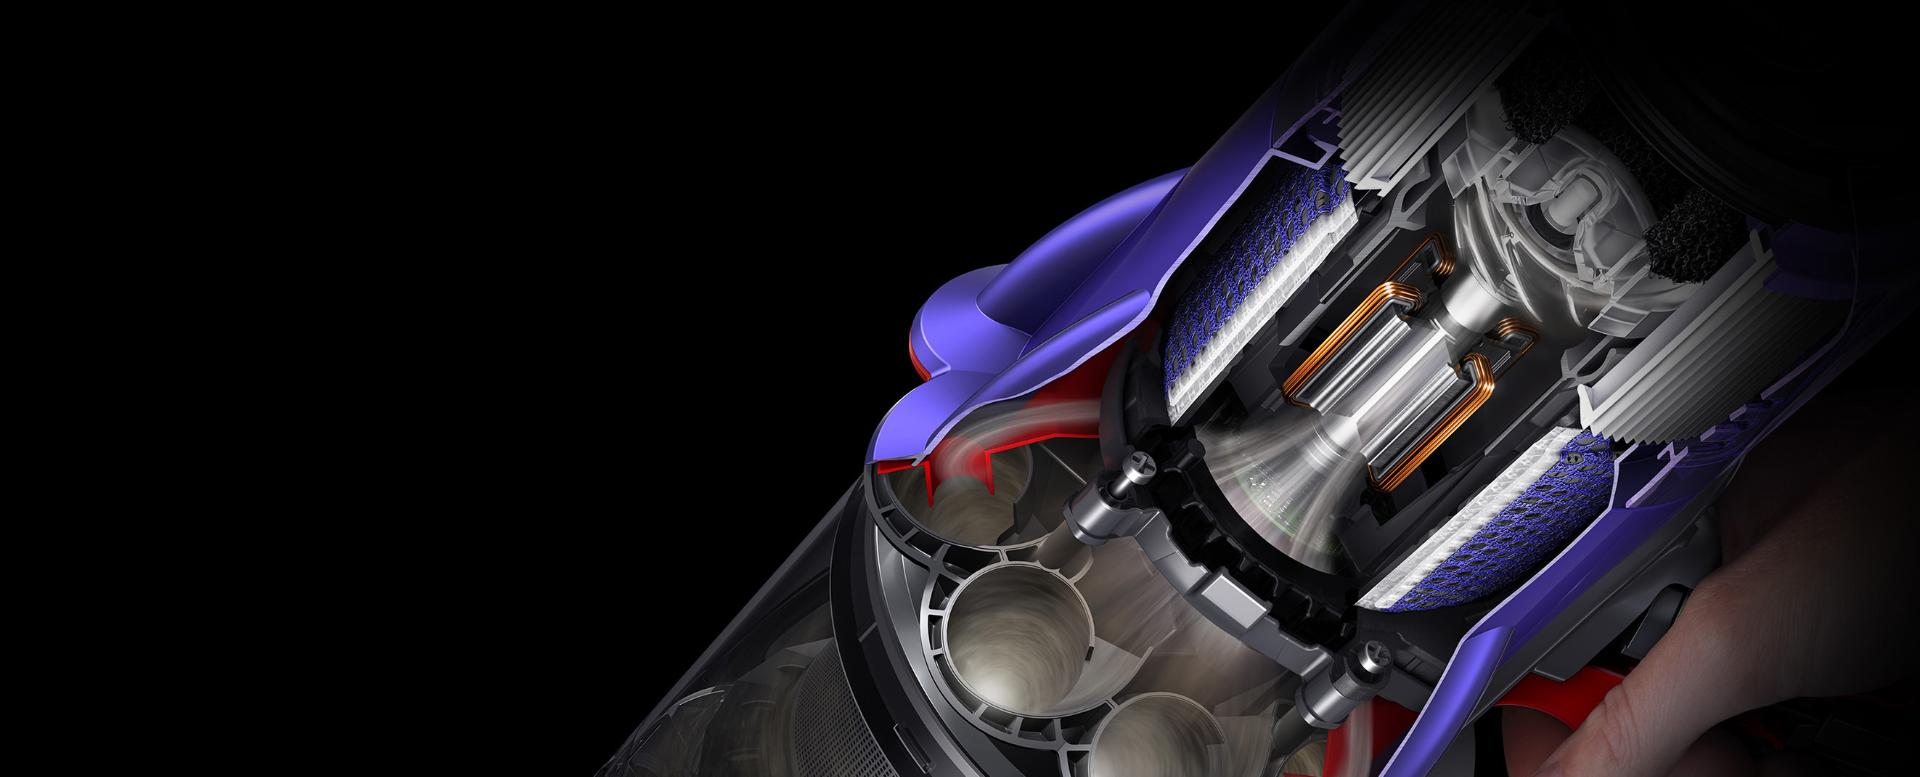 Cutaway diagram showing motor.